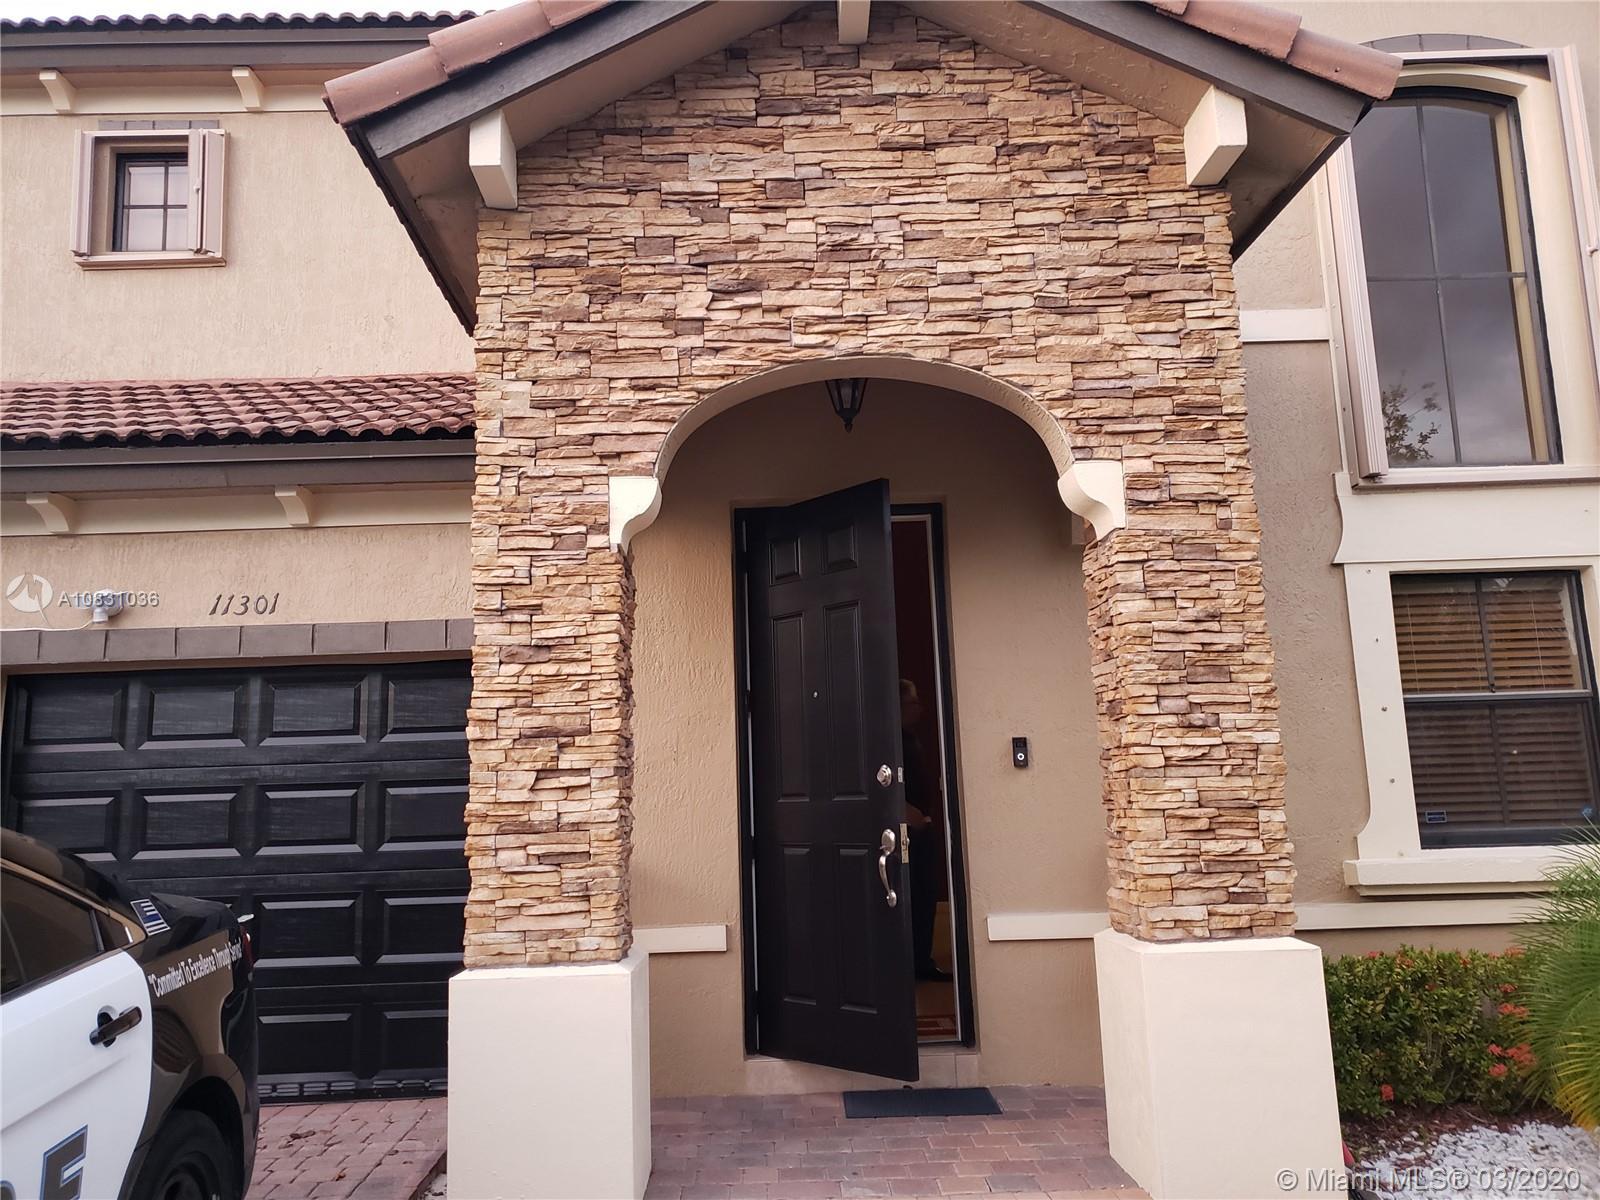 11301 SW 242nd St, Homestead, FL 33032 - Homestead, FL real estate listing